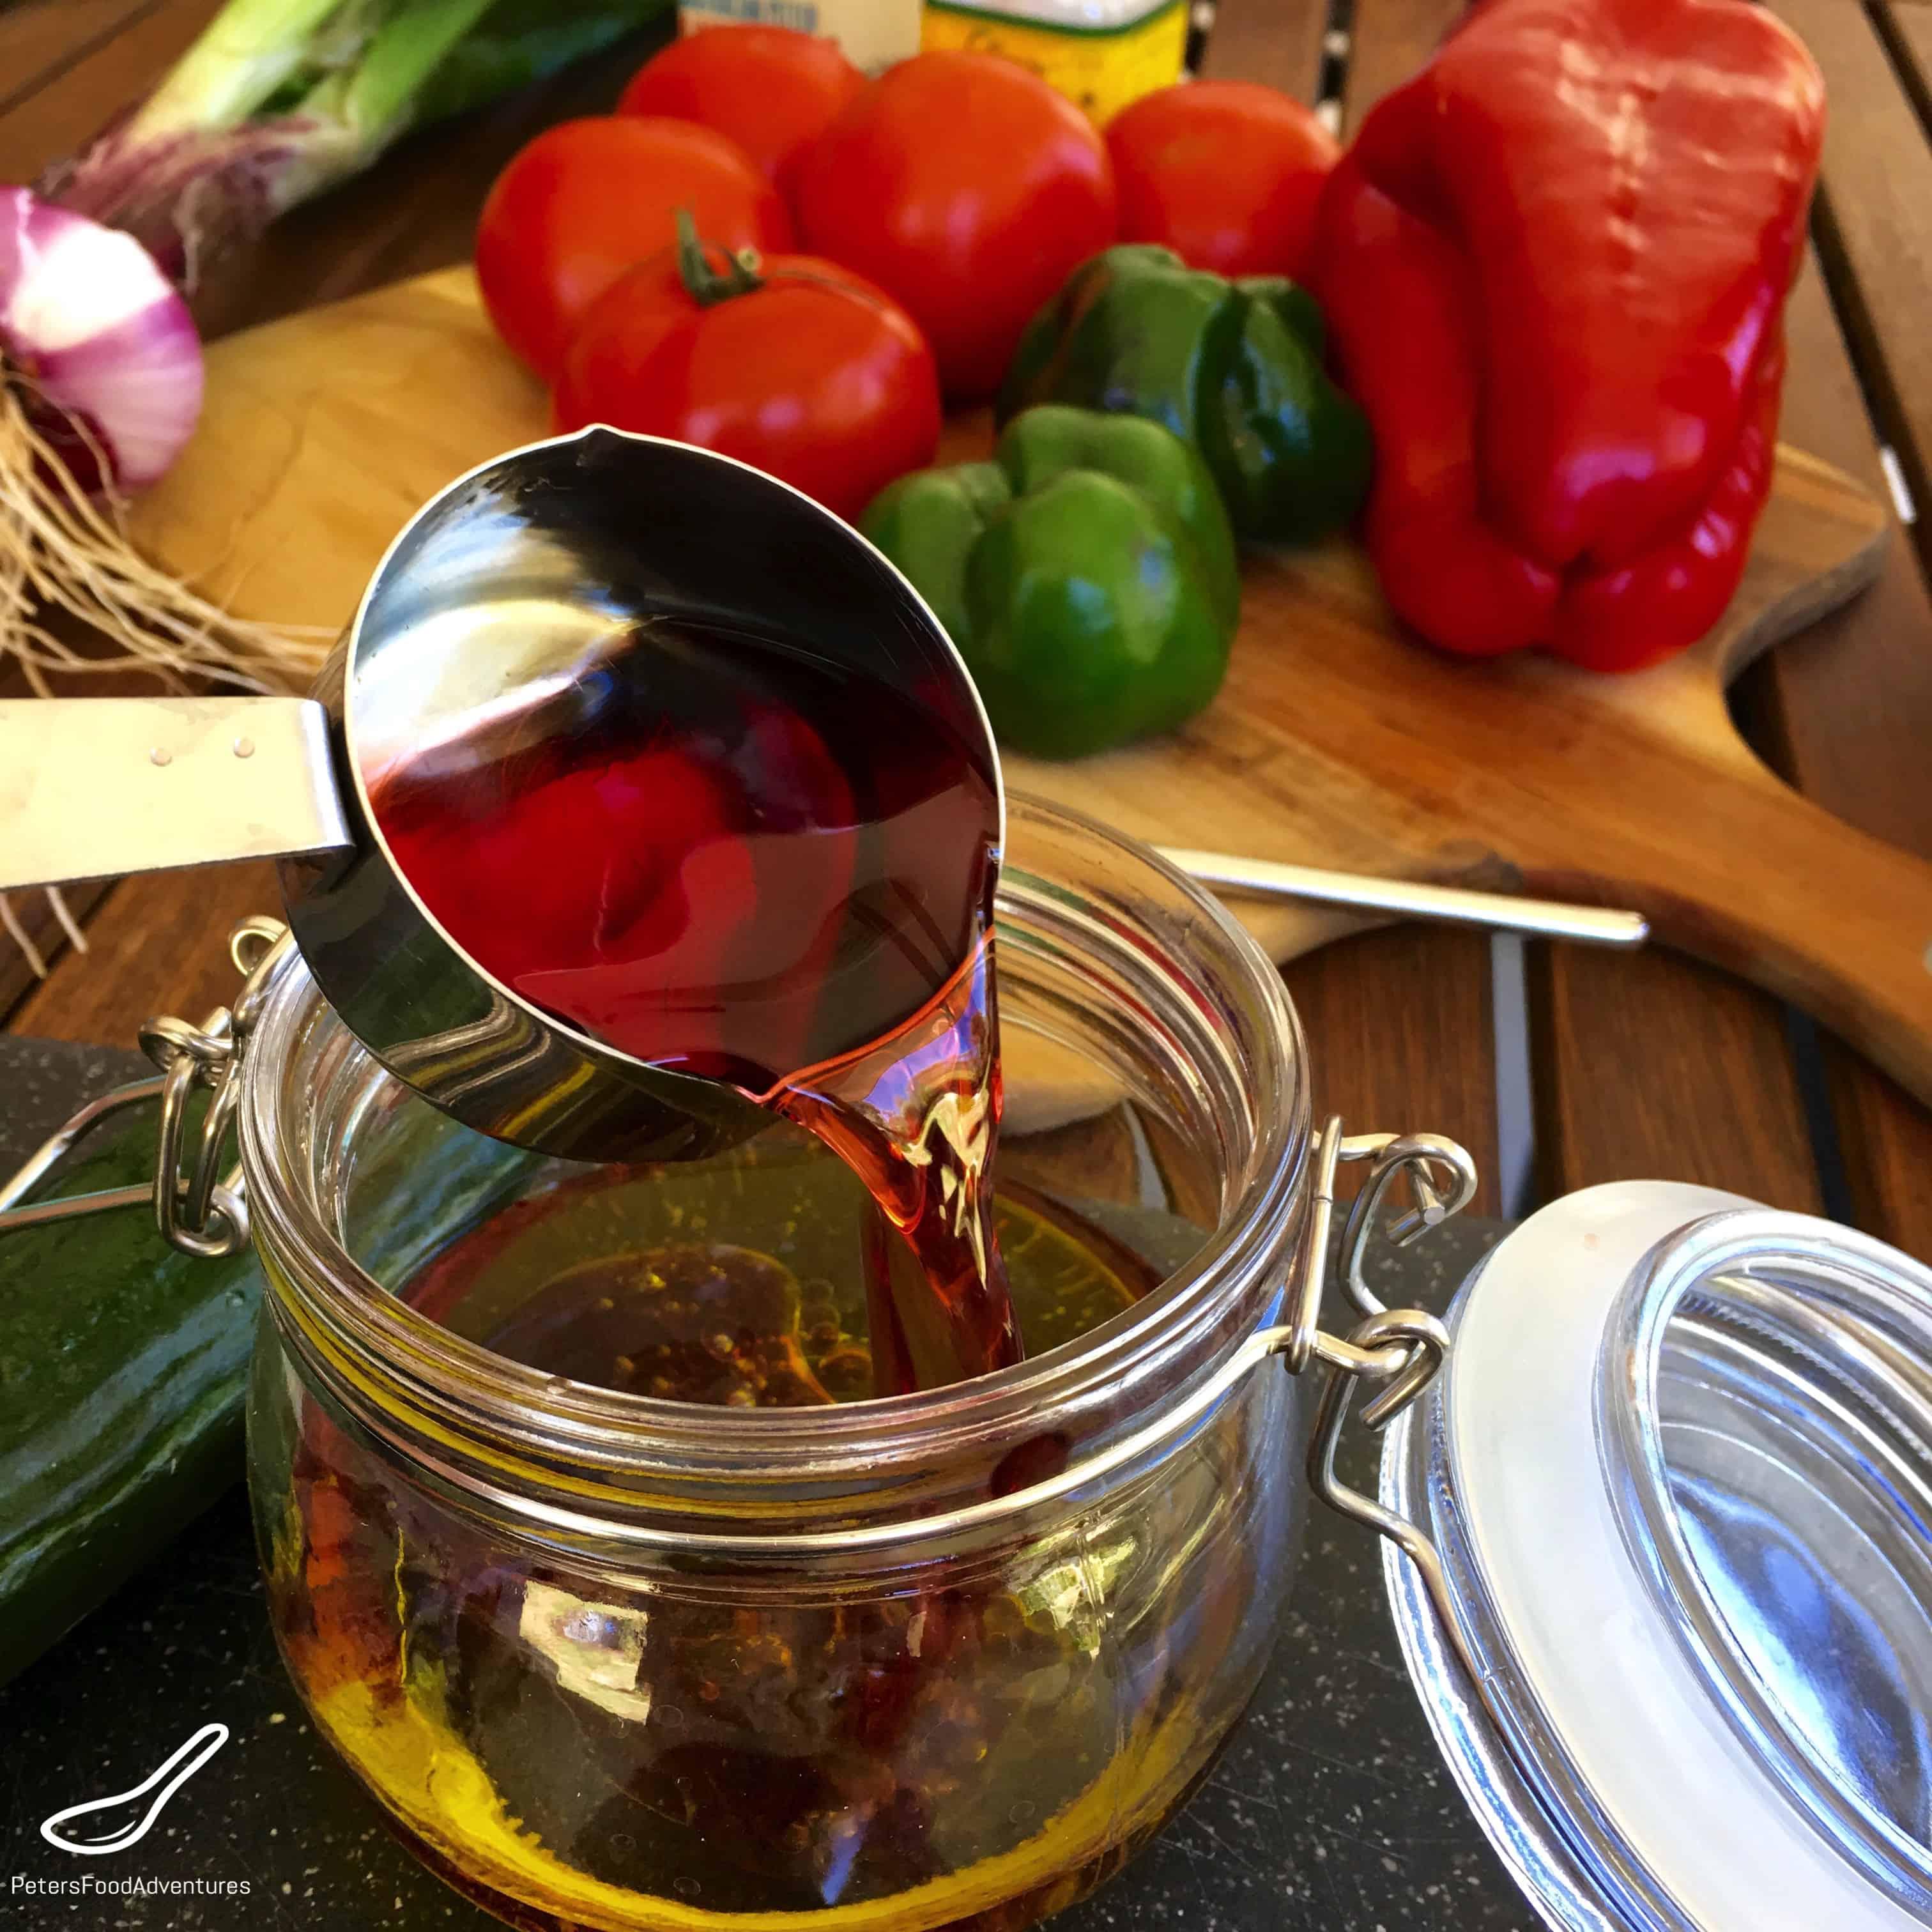 Greek salad recipe peters food adventures how to make greek salad dressing forumfinder Images